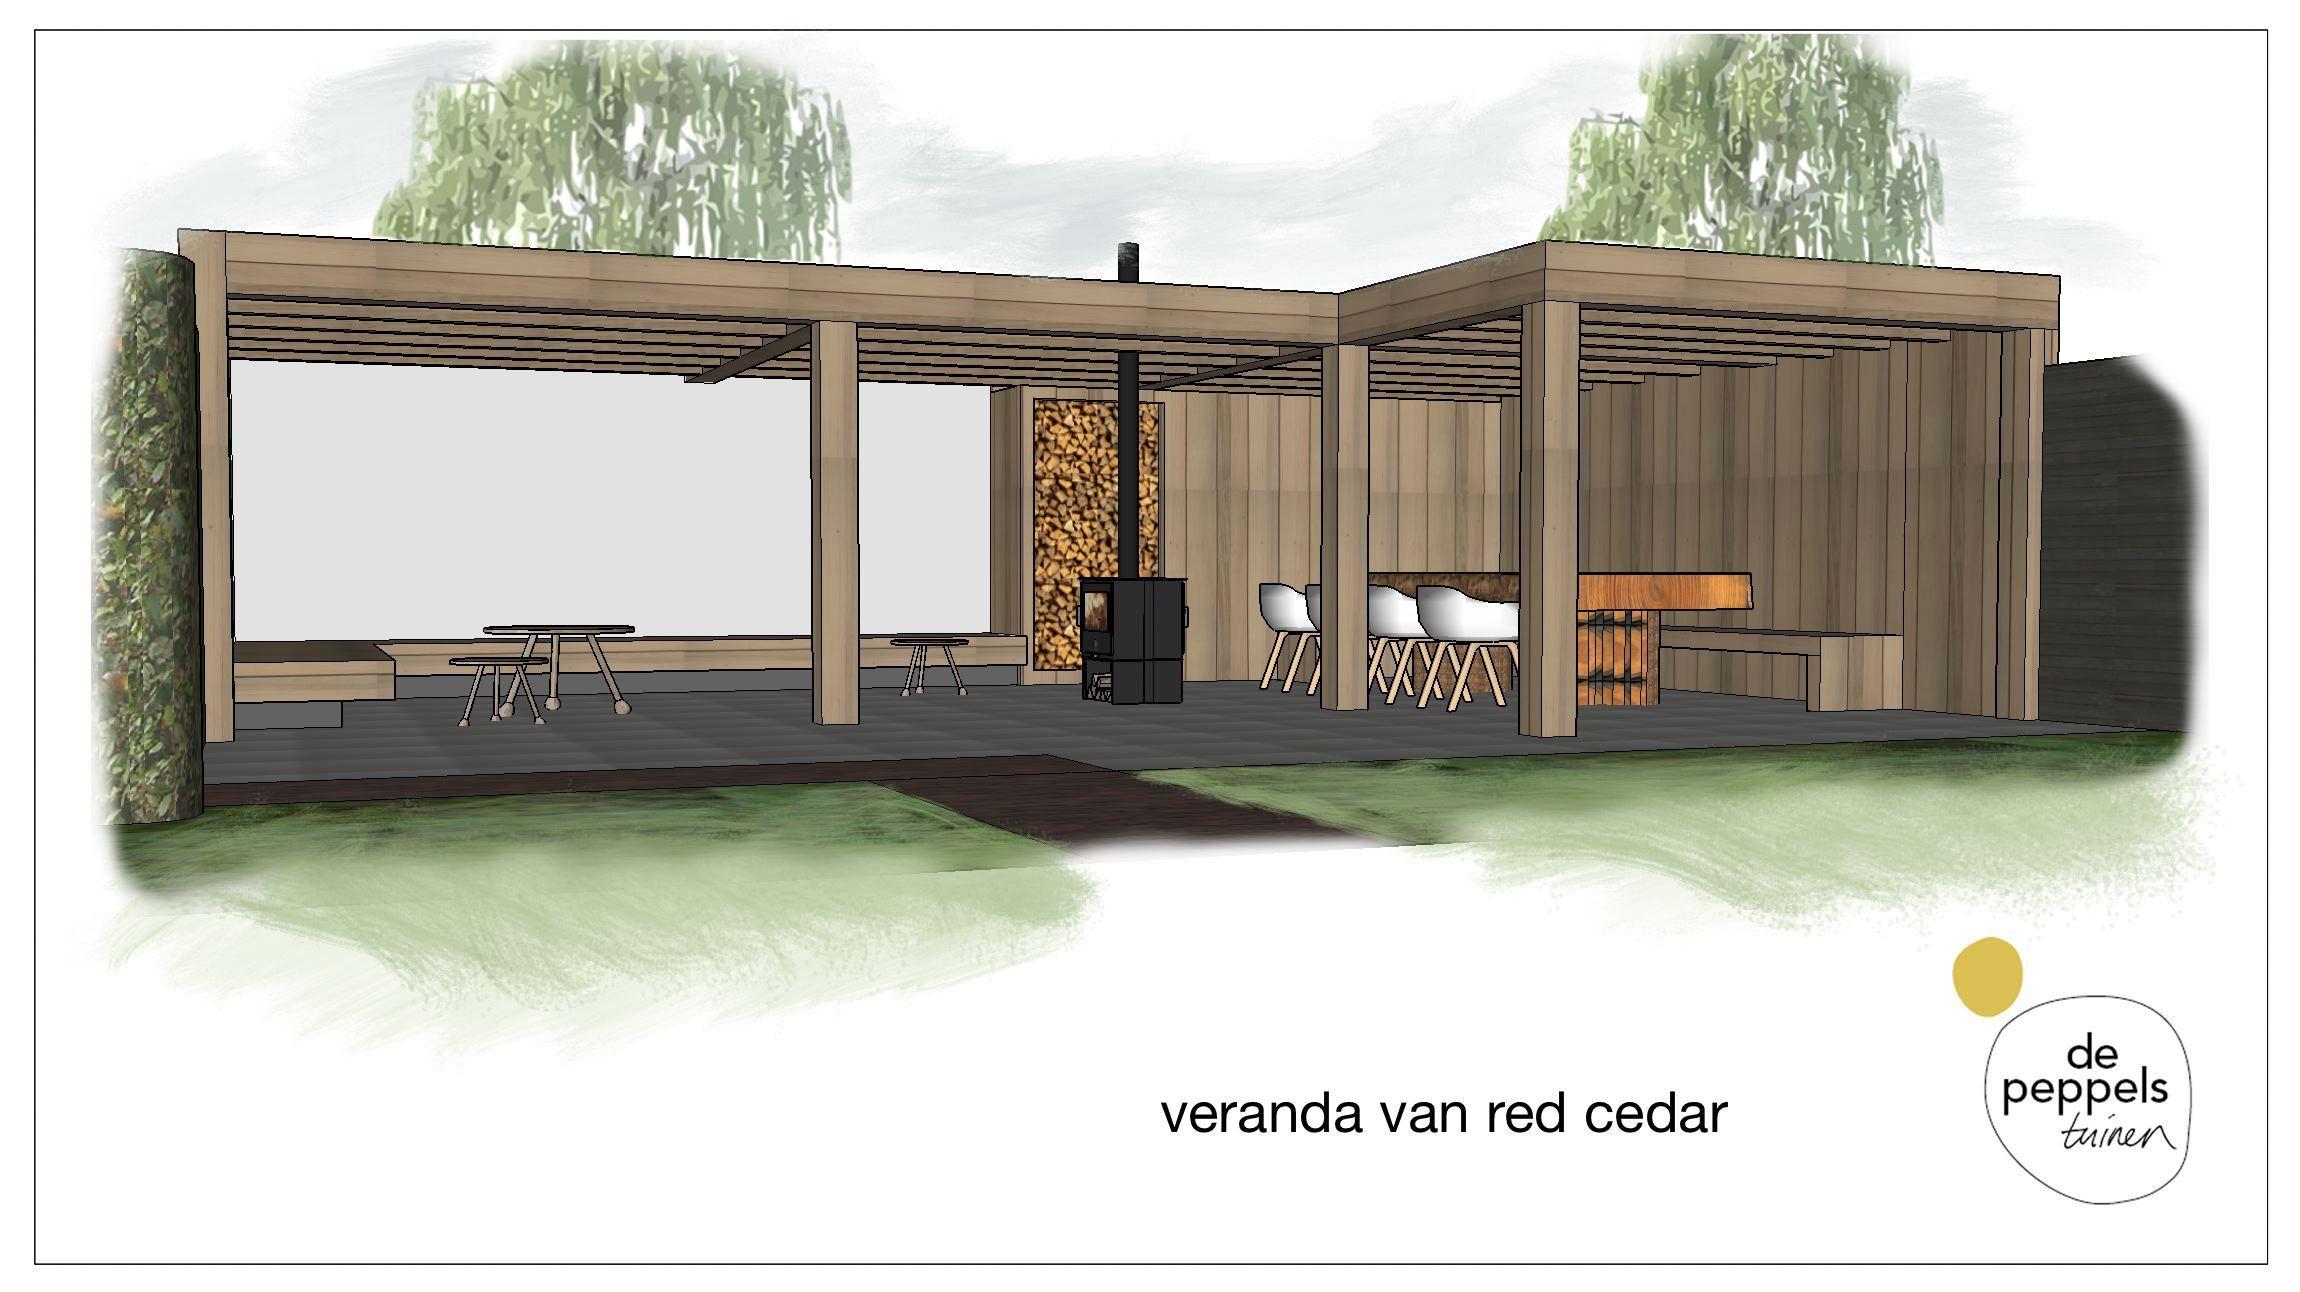 Houten veranda van red cedar tuin pinterest veranda for Tuinarchitect modern strak